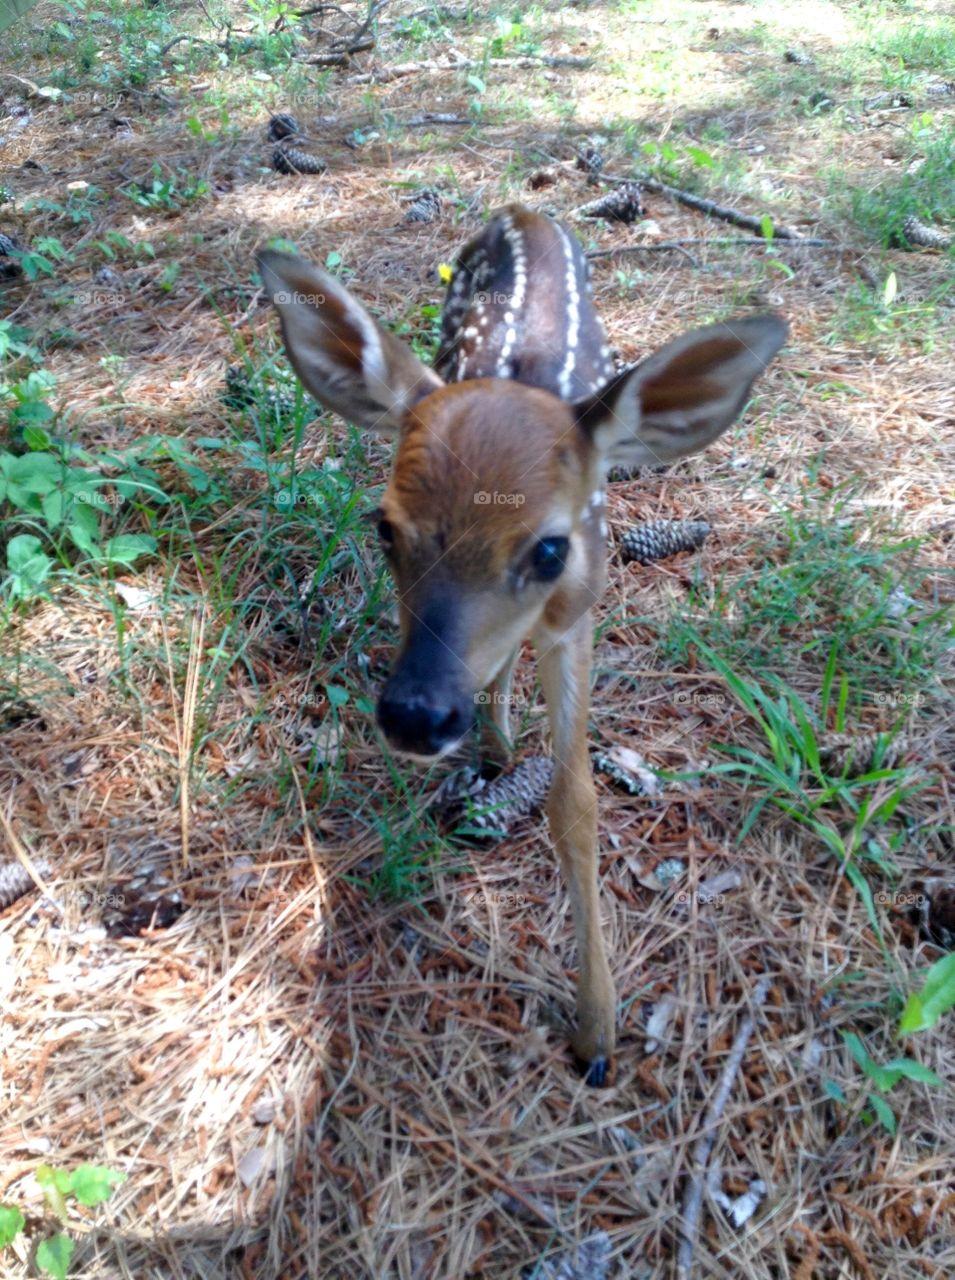 Mammal, Wildlife, Nature, Deer, Animal